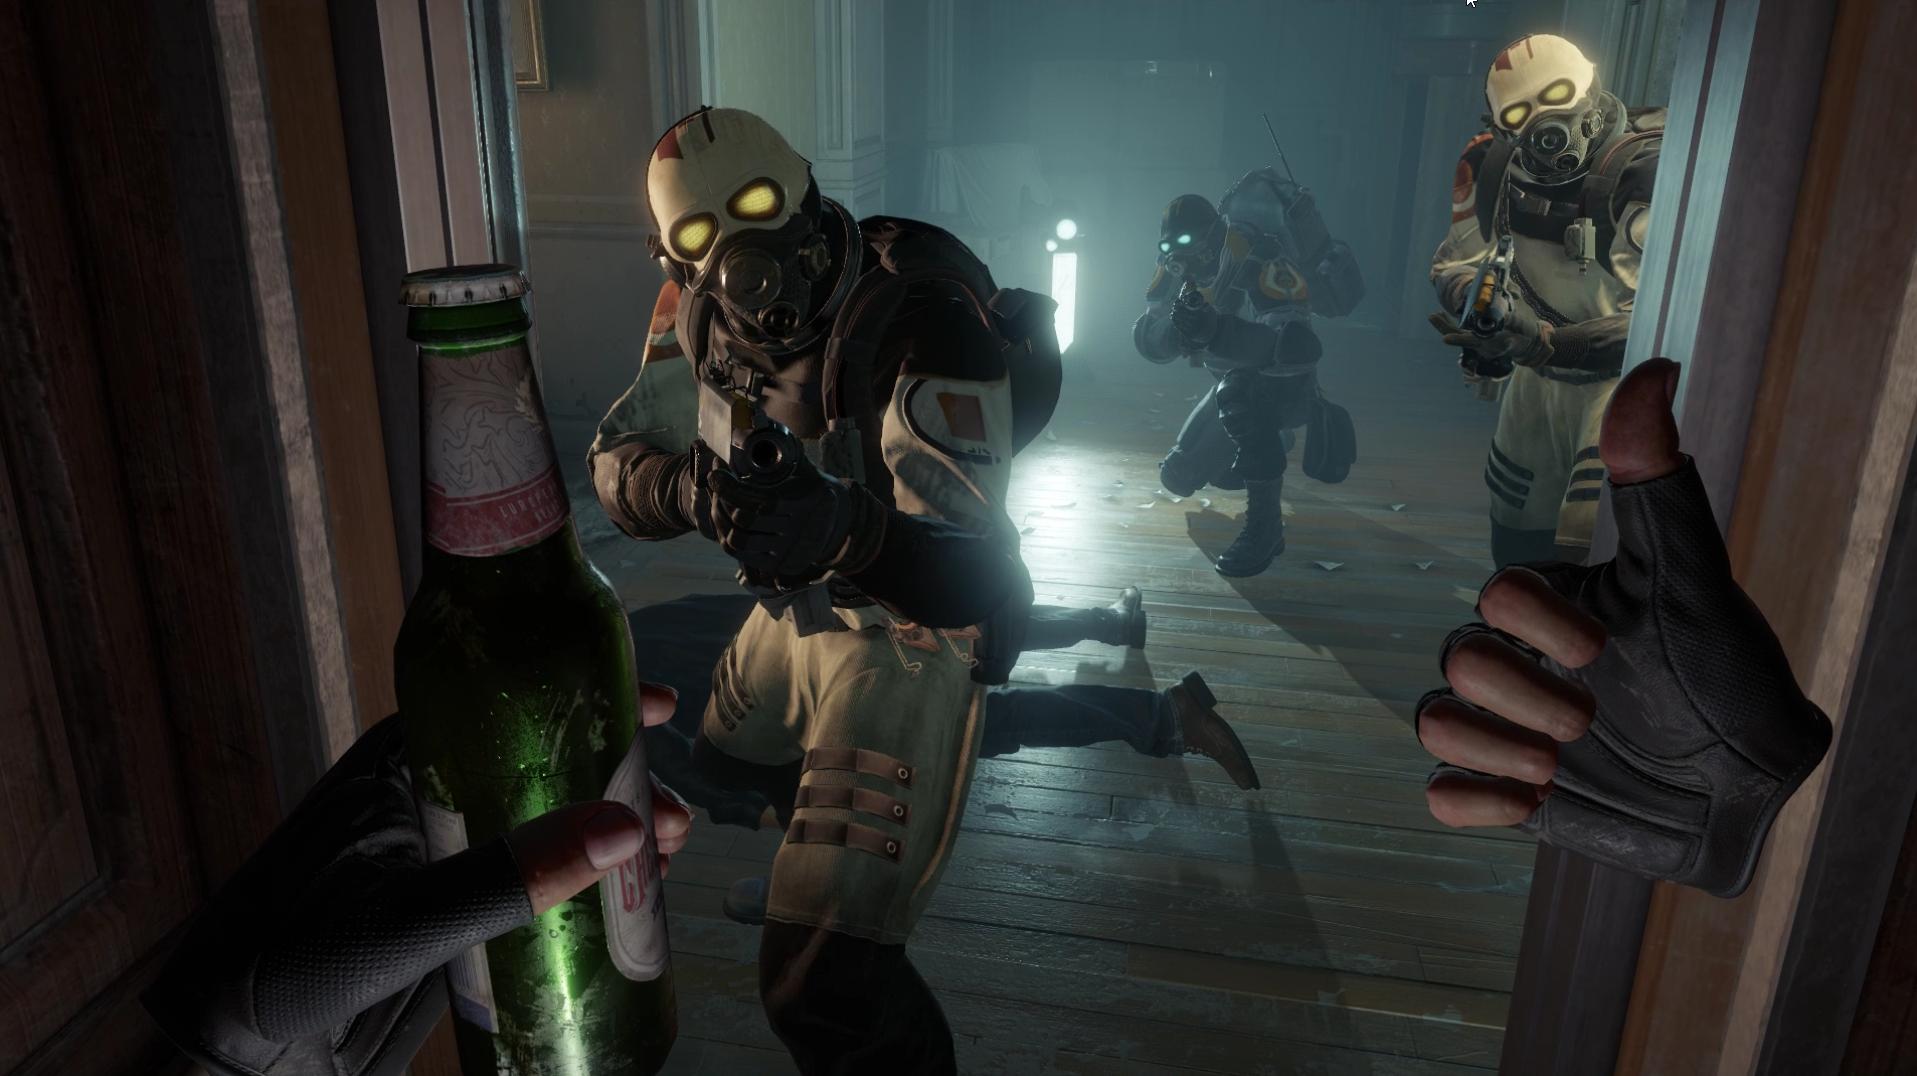 Half-Life : Alyx Impressions: Virtually Amazing